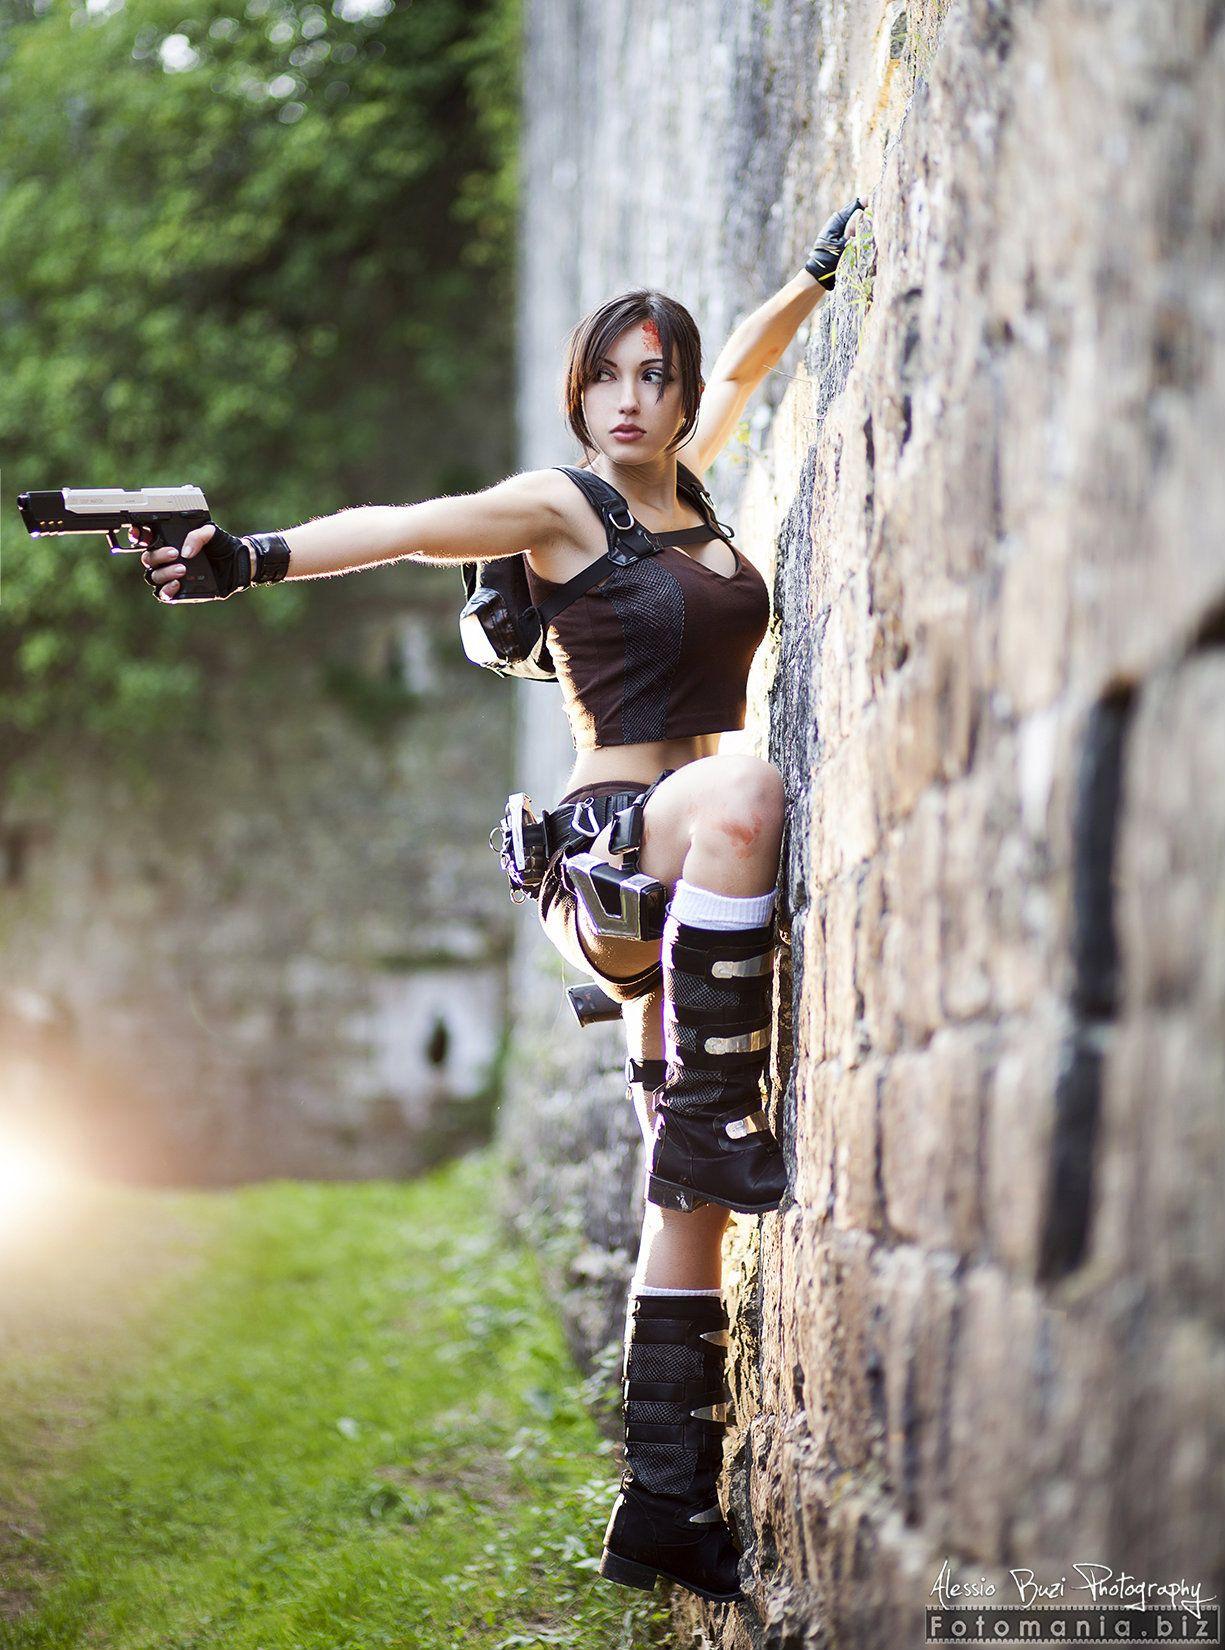 Tomb Raider:Underworld-feel the rush by Anastasya01 on